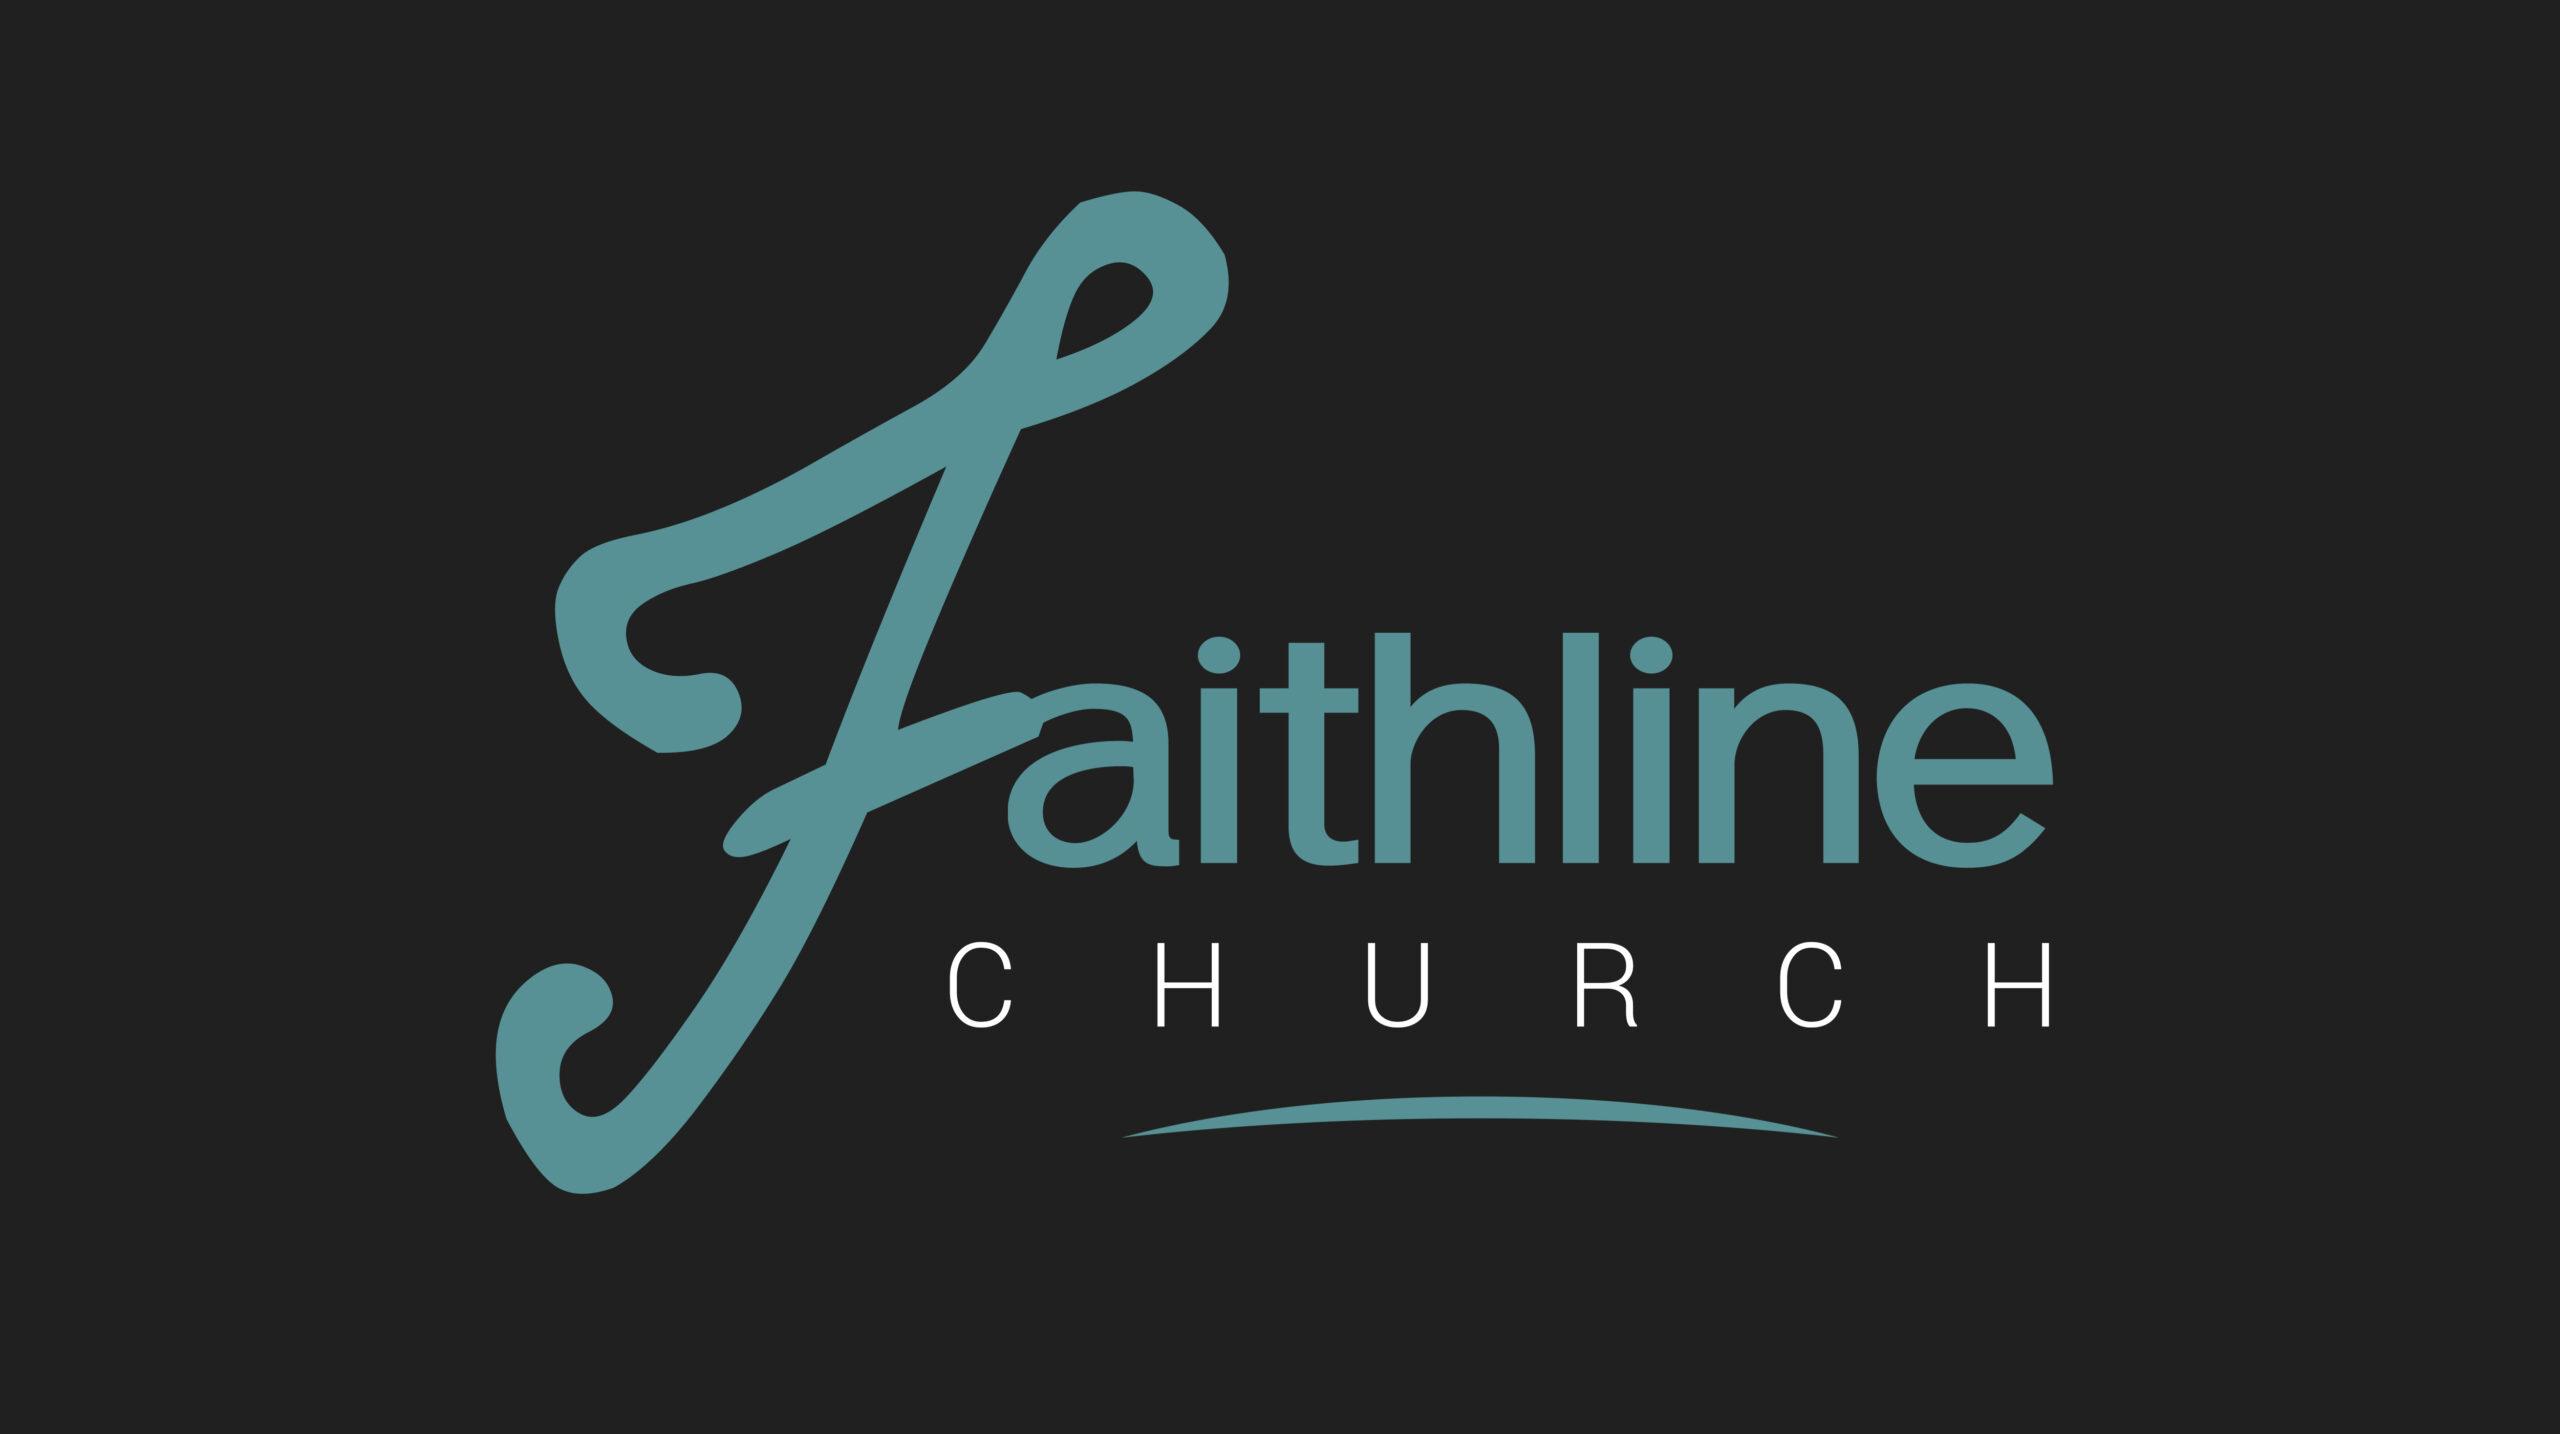 faithline-church-logo-design